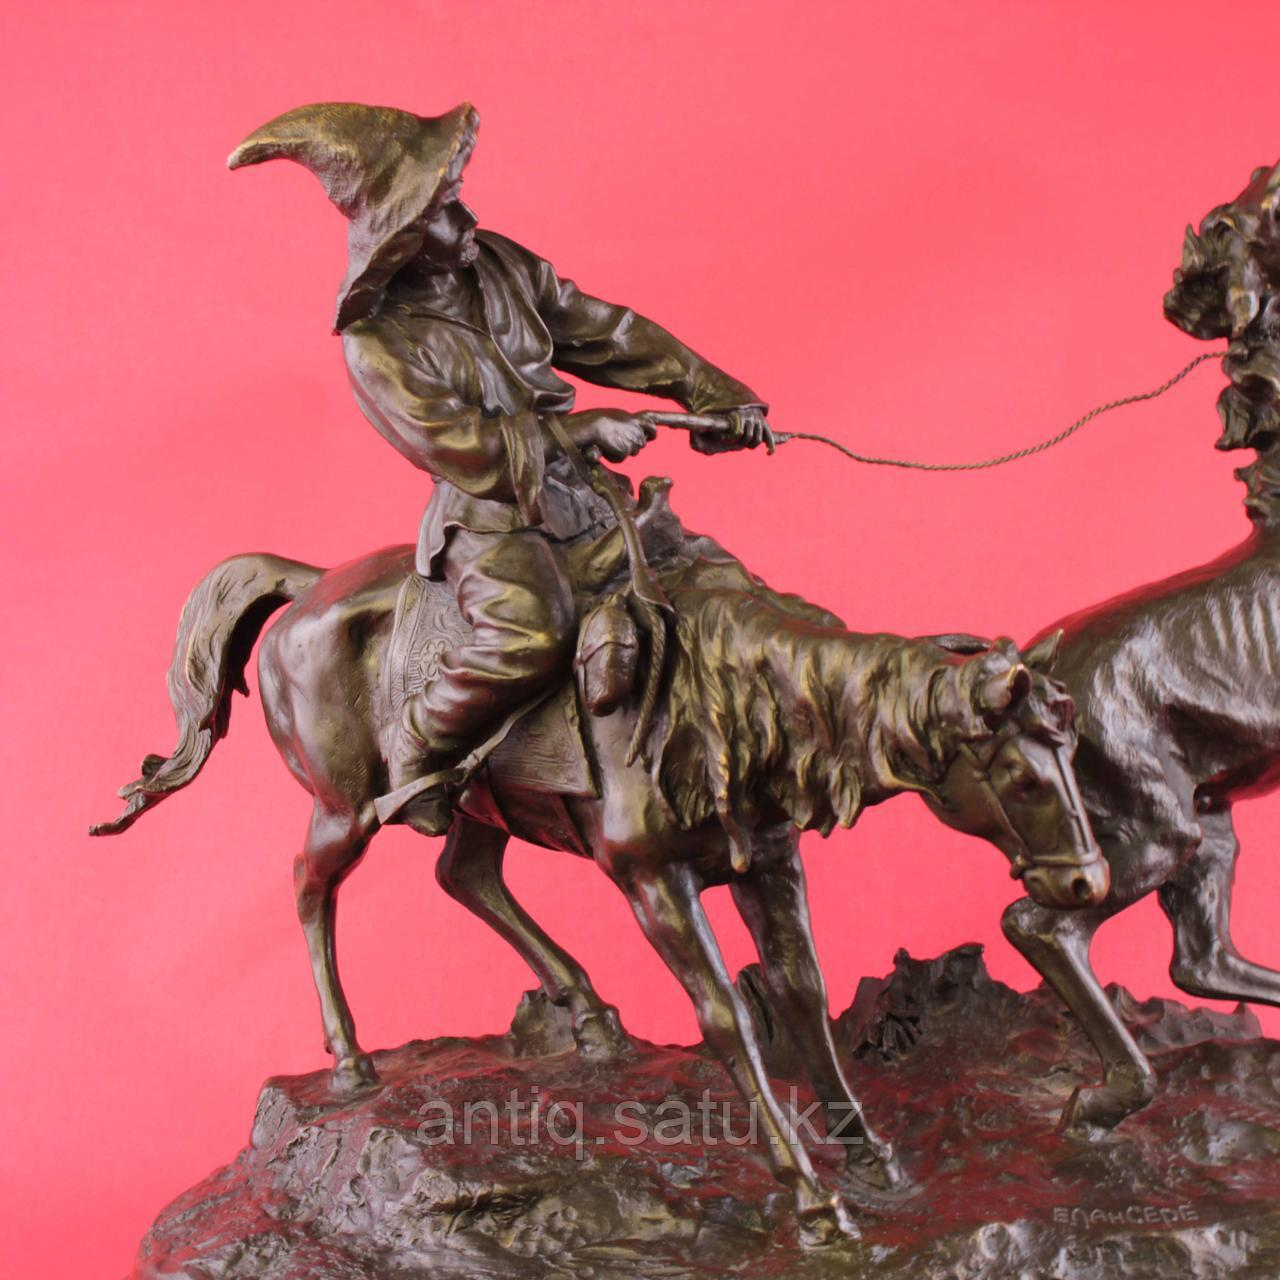 Скульптурная композиция «Ловля дикой лошади» По модели Е.А. Лансере (1848-1886) - фото 4